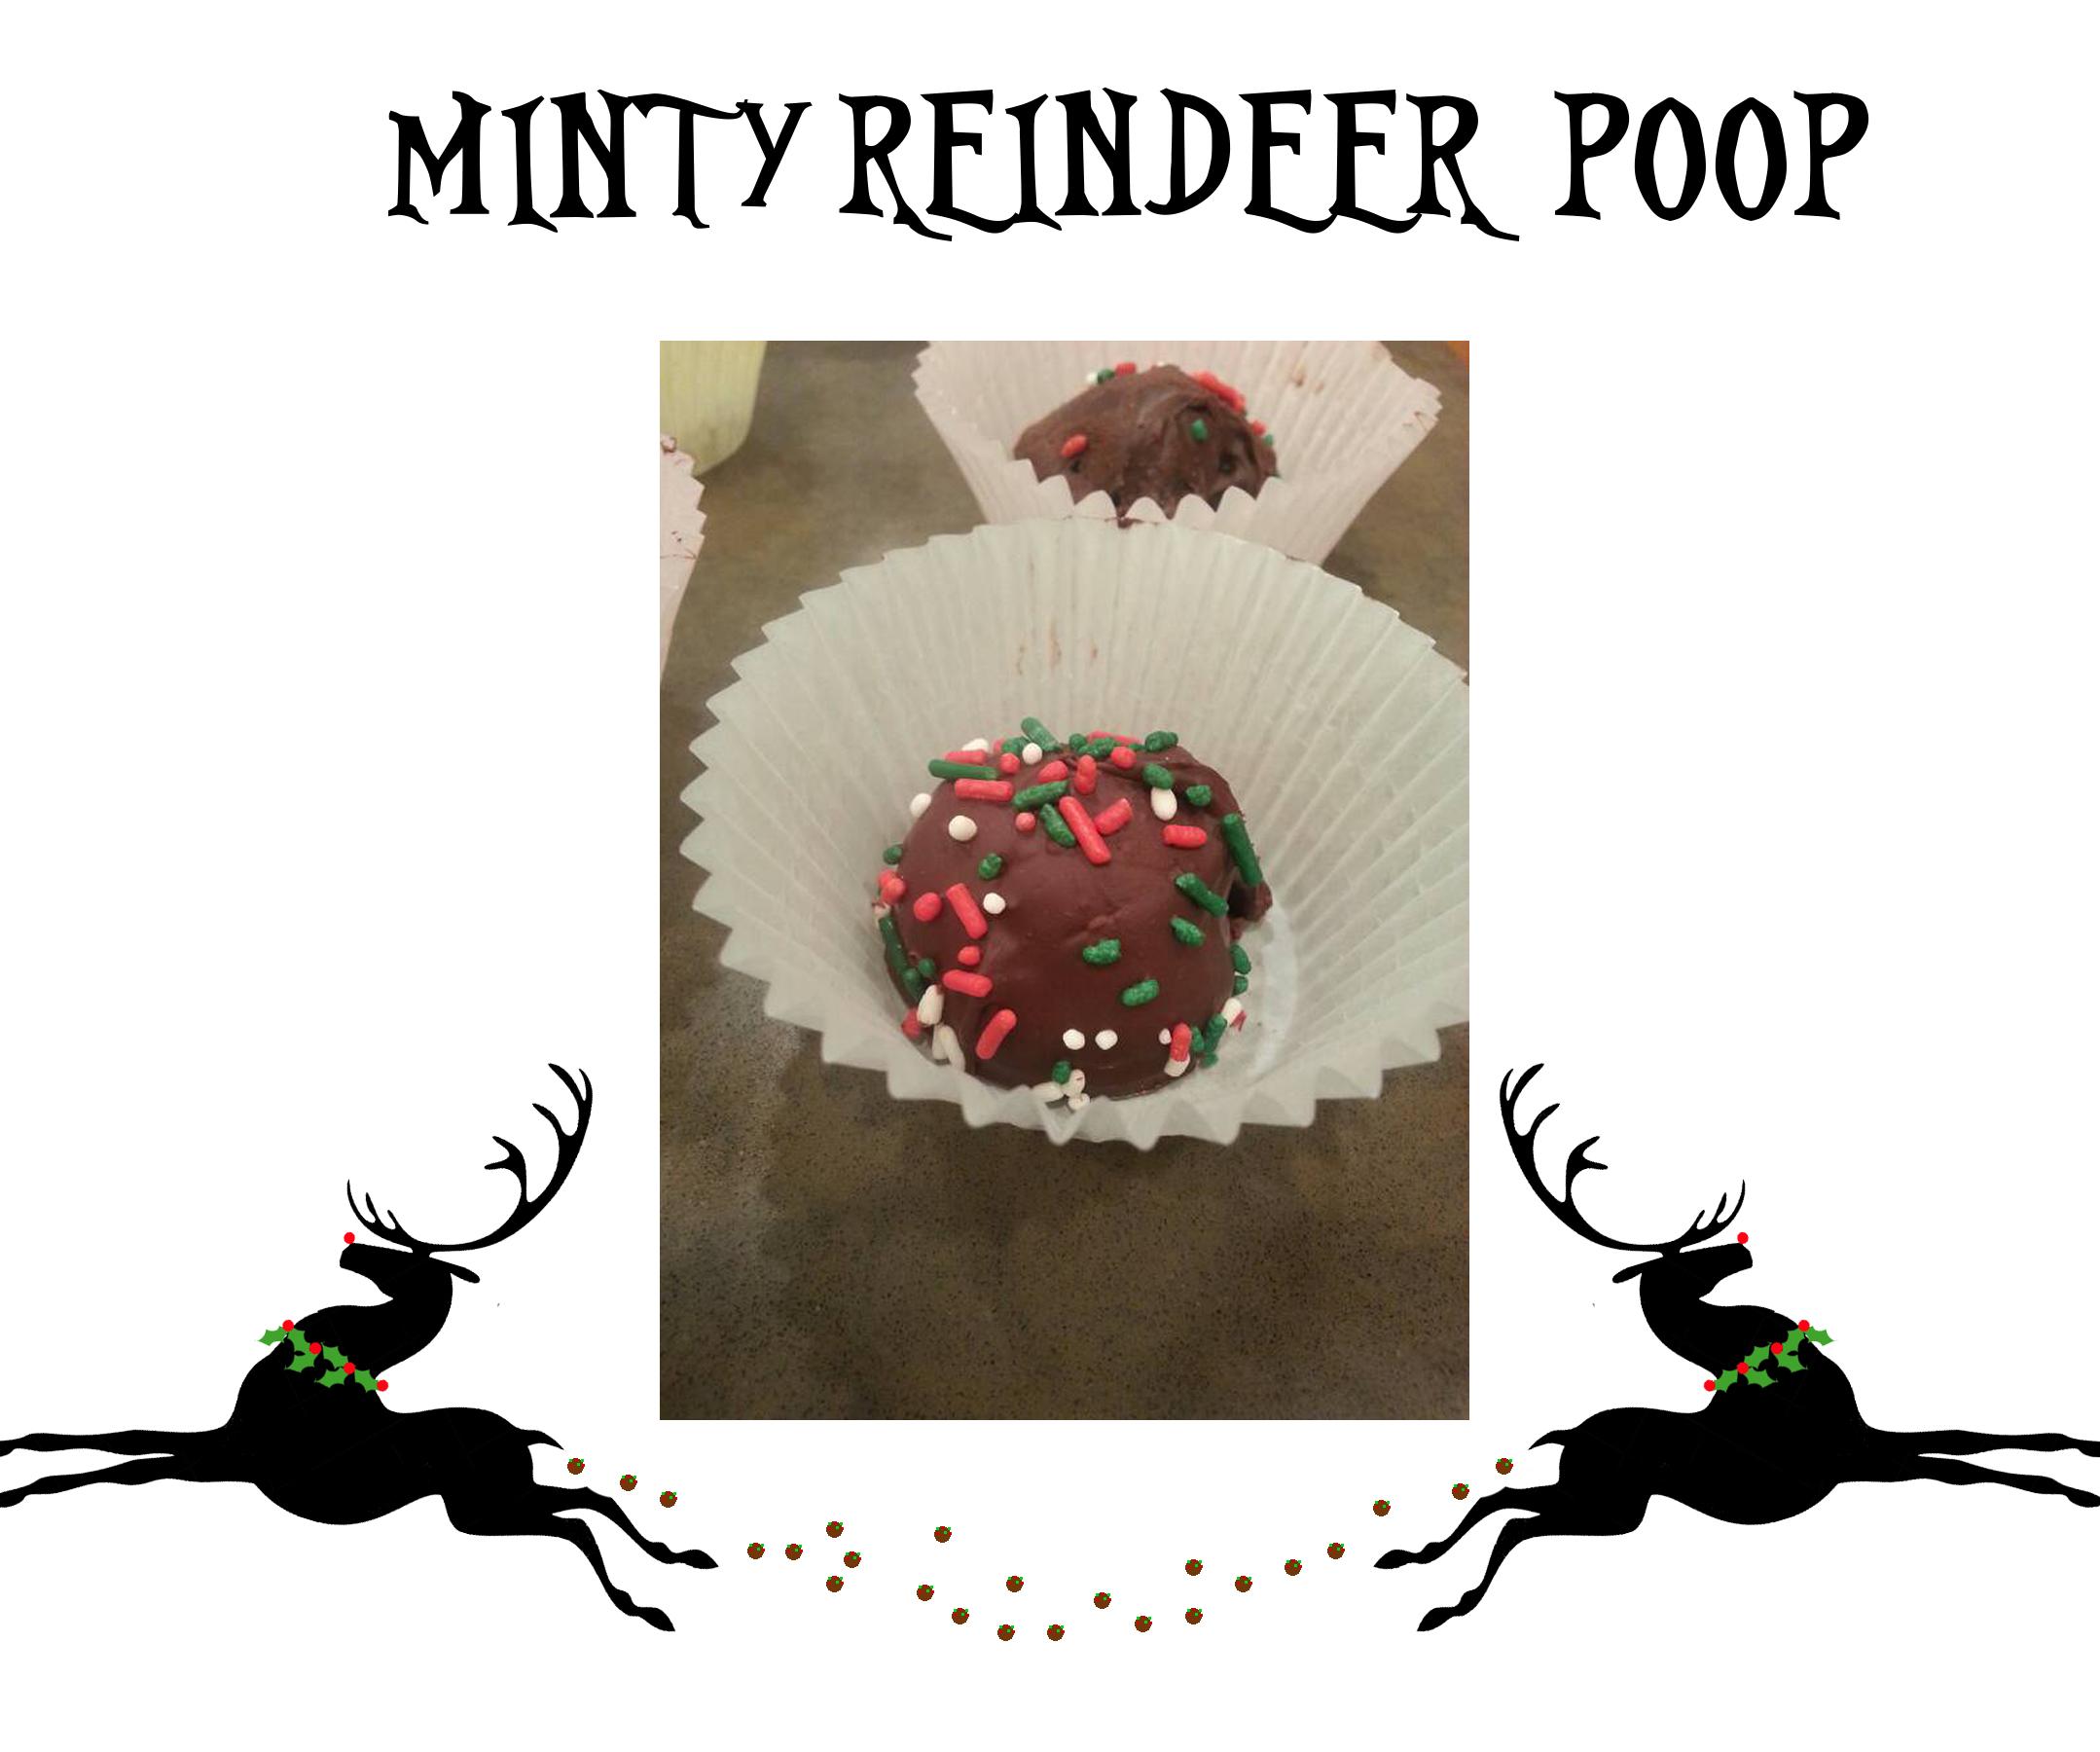 Minty Reindeer Poop no bake truffles (warning-slightly inappropriate and totally subversive)